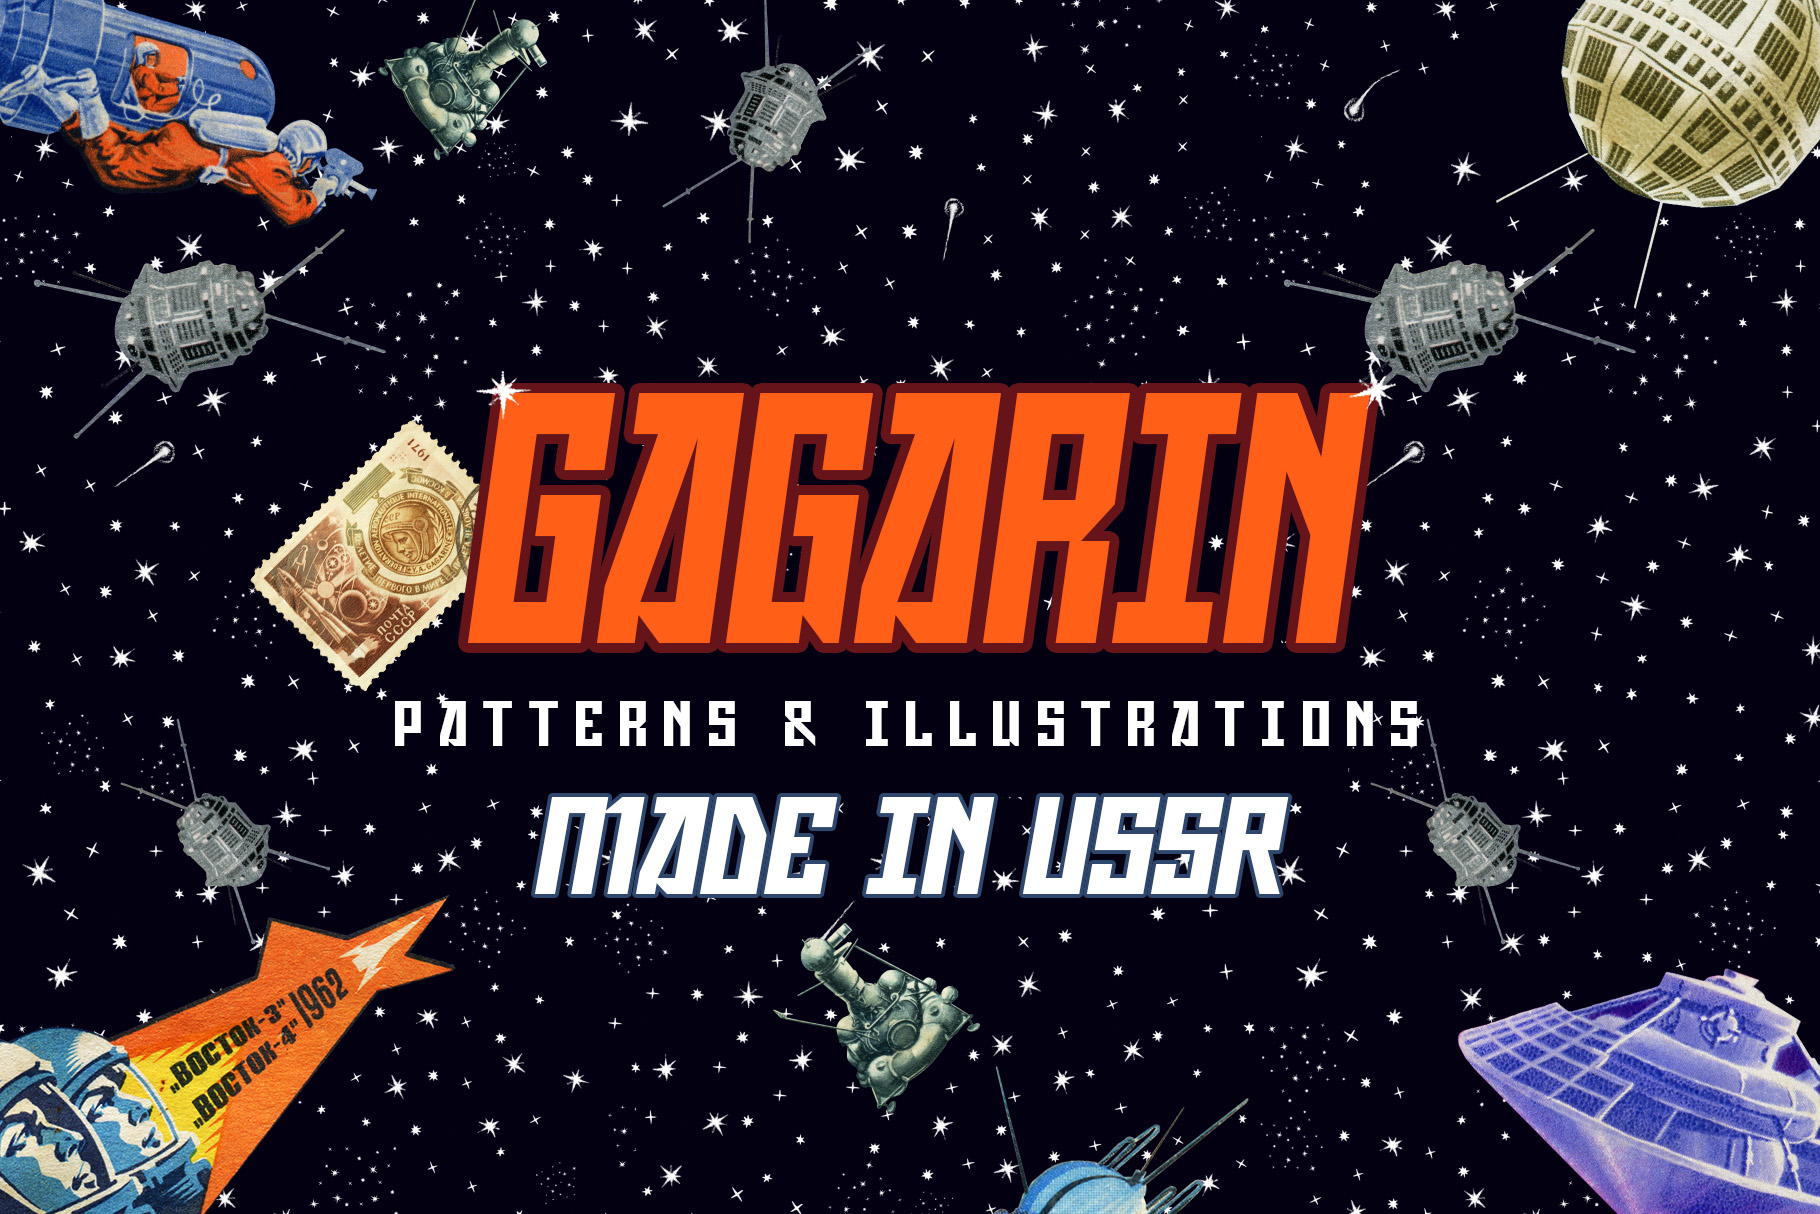 Gagarin - Patterns & Illustrations example image 1